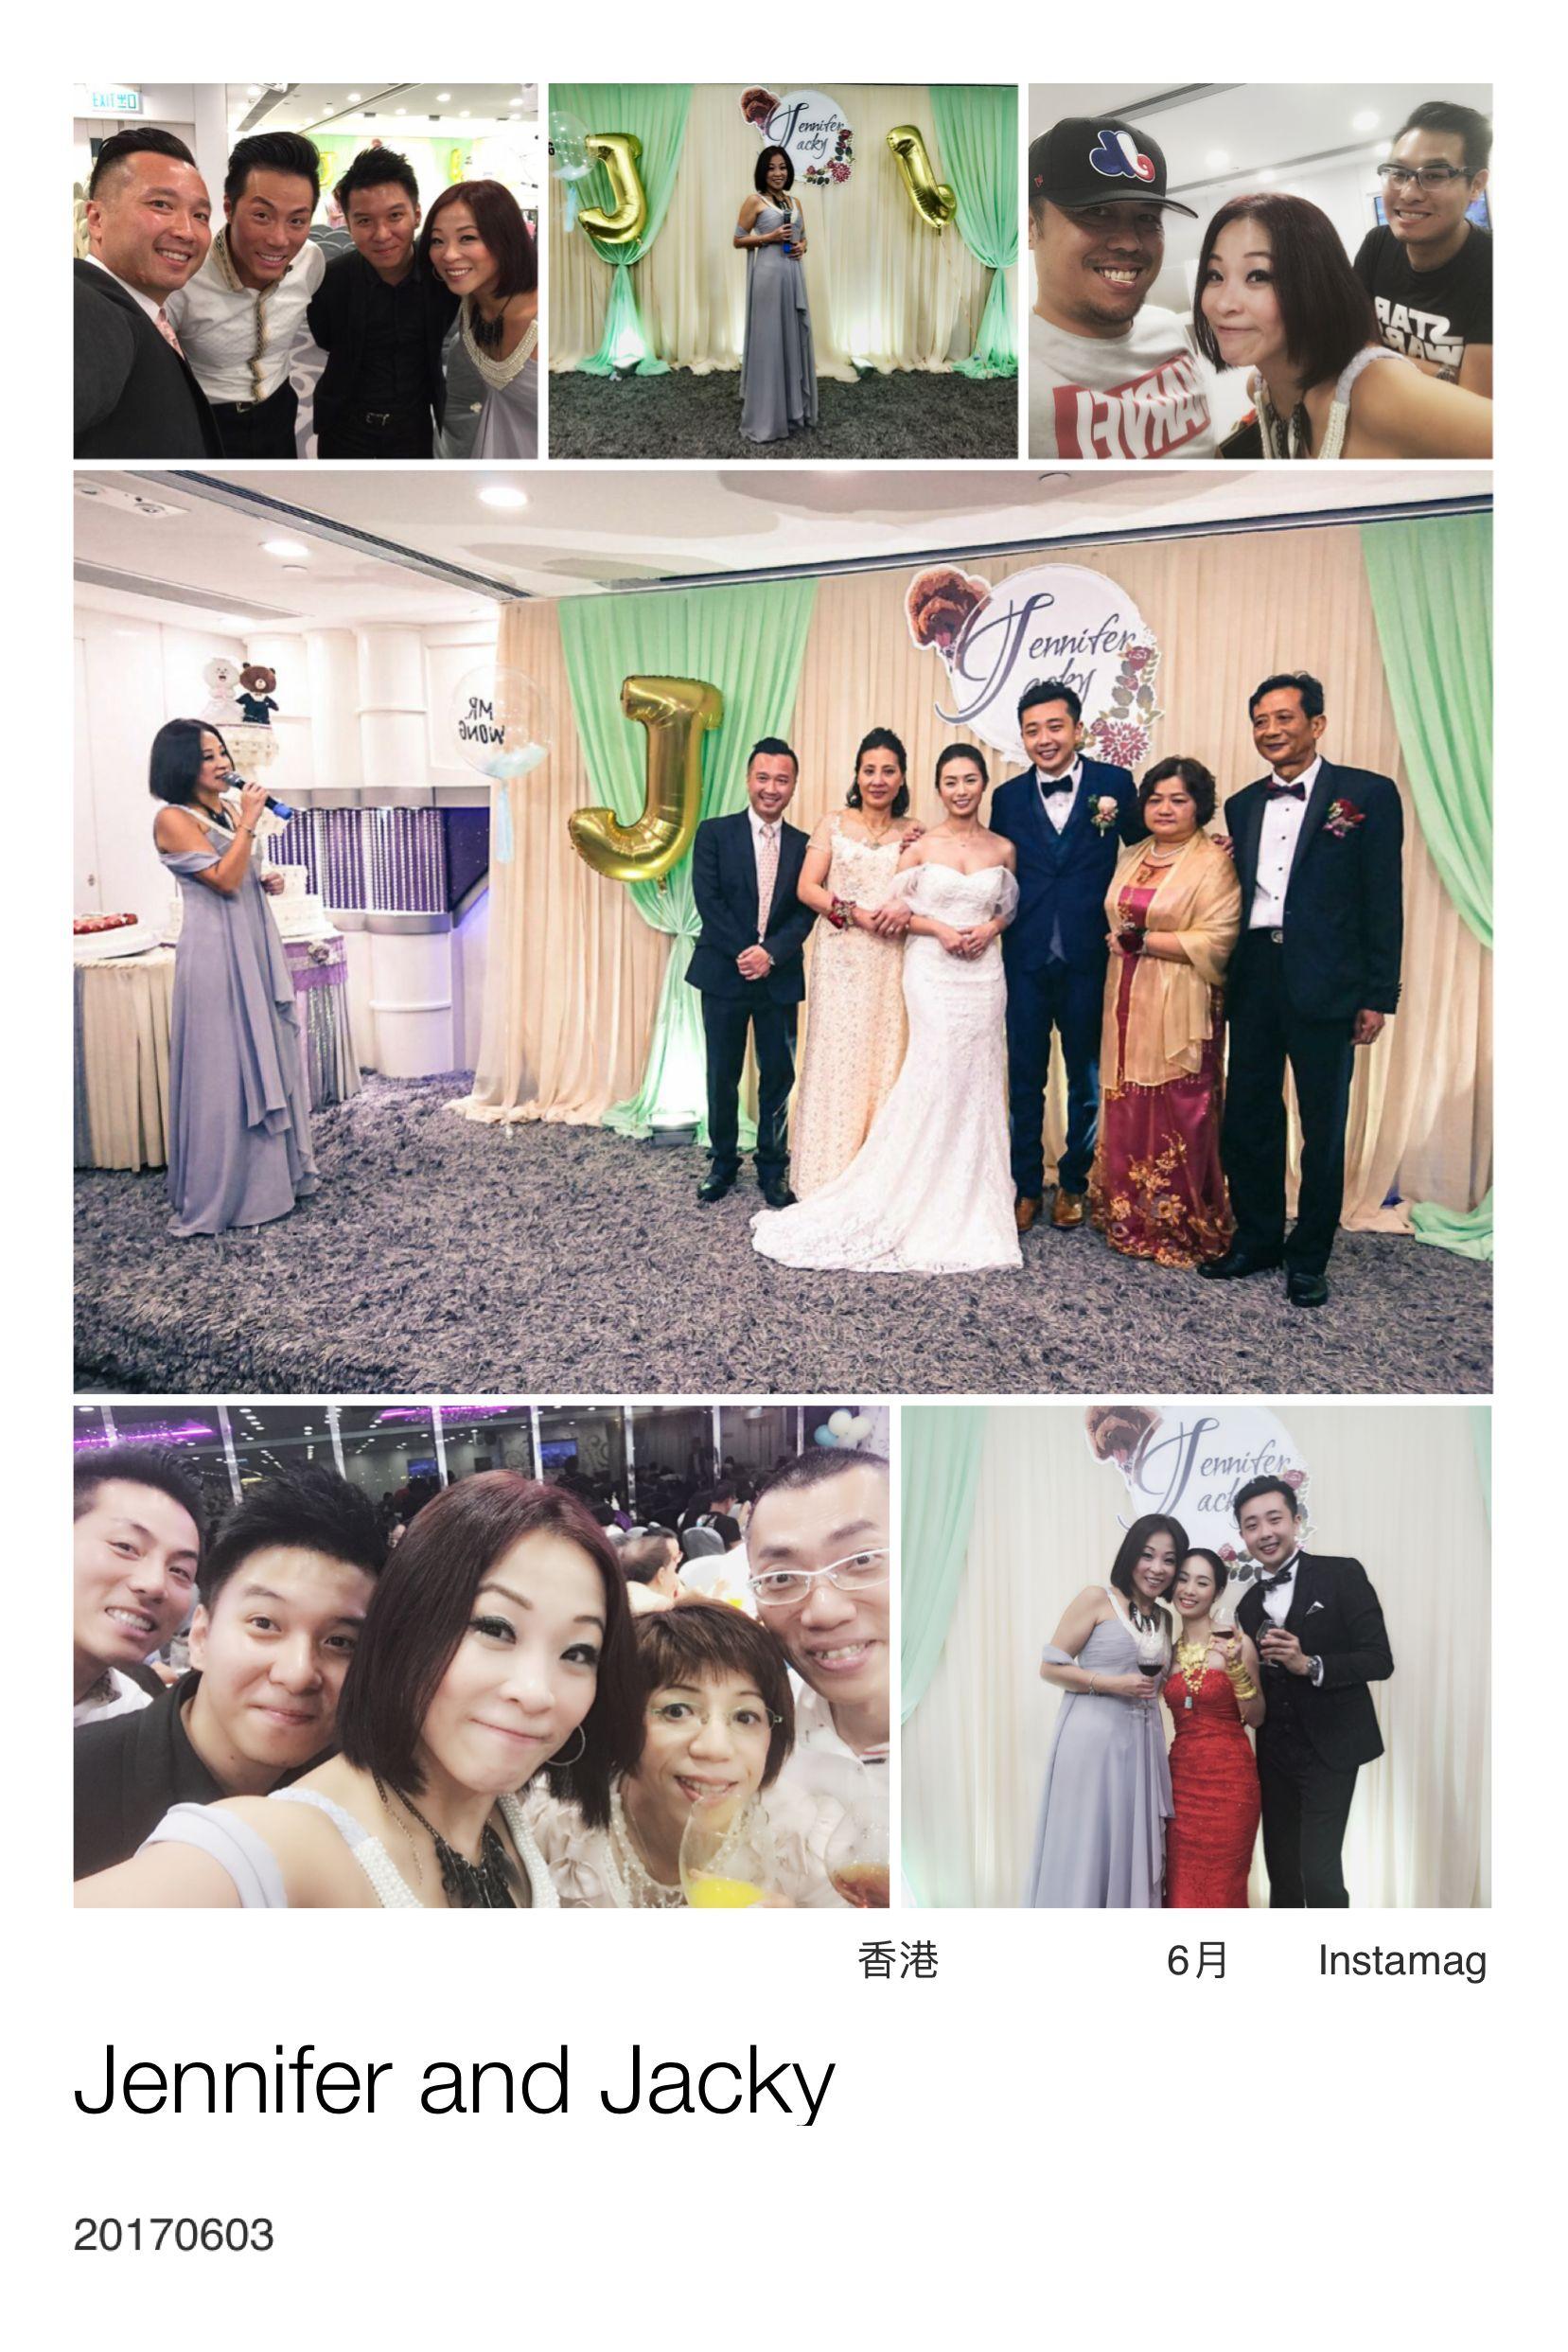 婚禮司儀 Wedding MC Michelle 就係我啦 </p></noscript> </div><!-- .entry-content -->  <hr />  </article><!-- #post-4995 -->   <nav class=